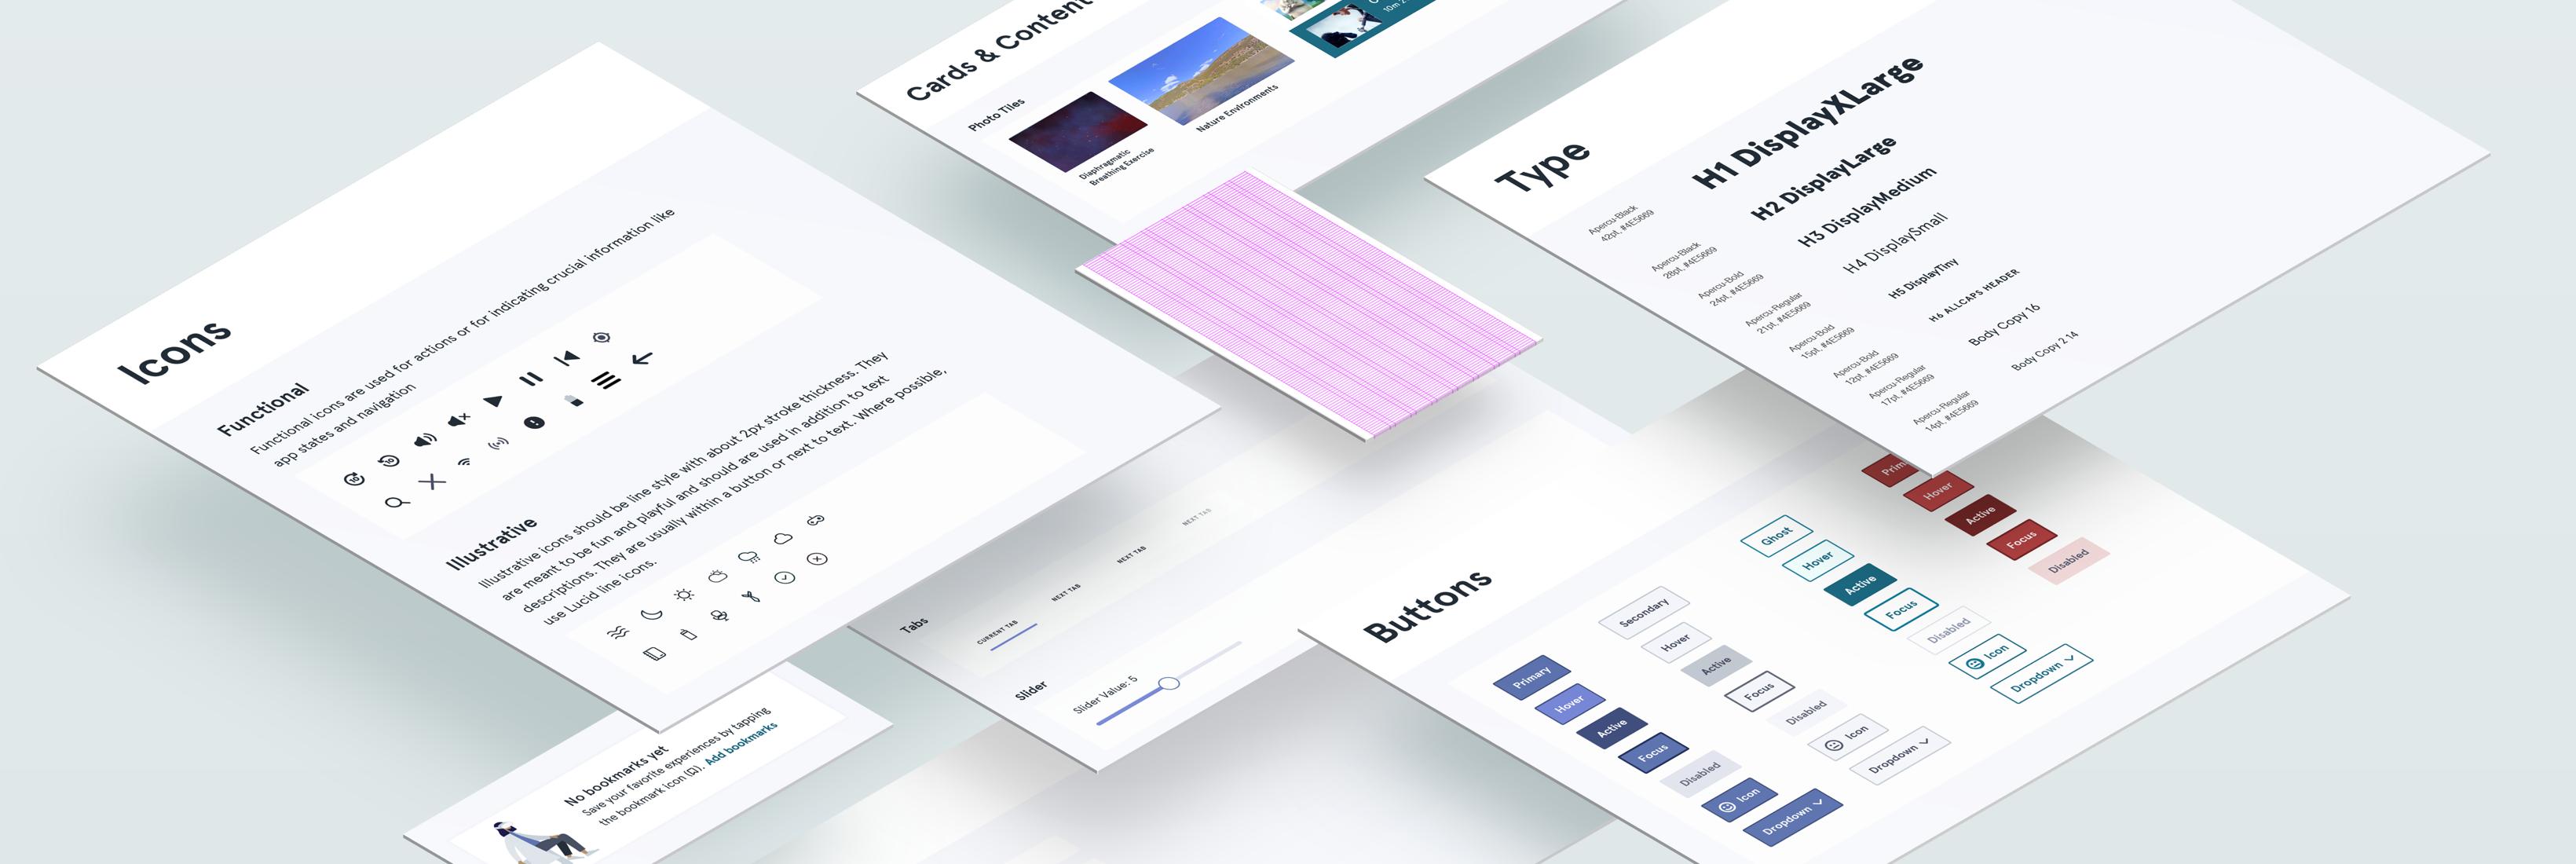 Myla Fay › Limbix Design System